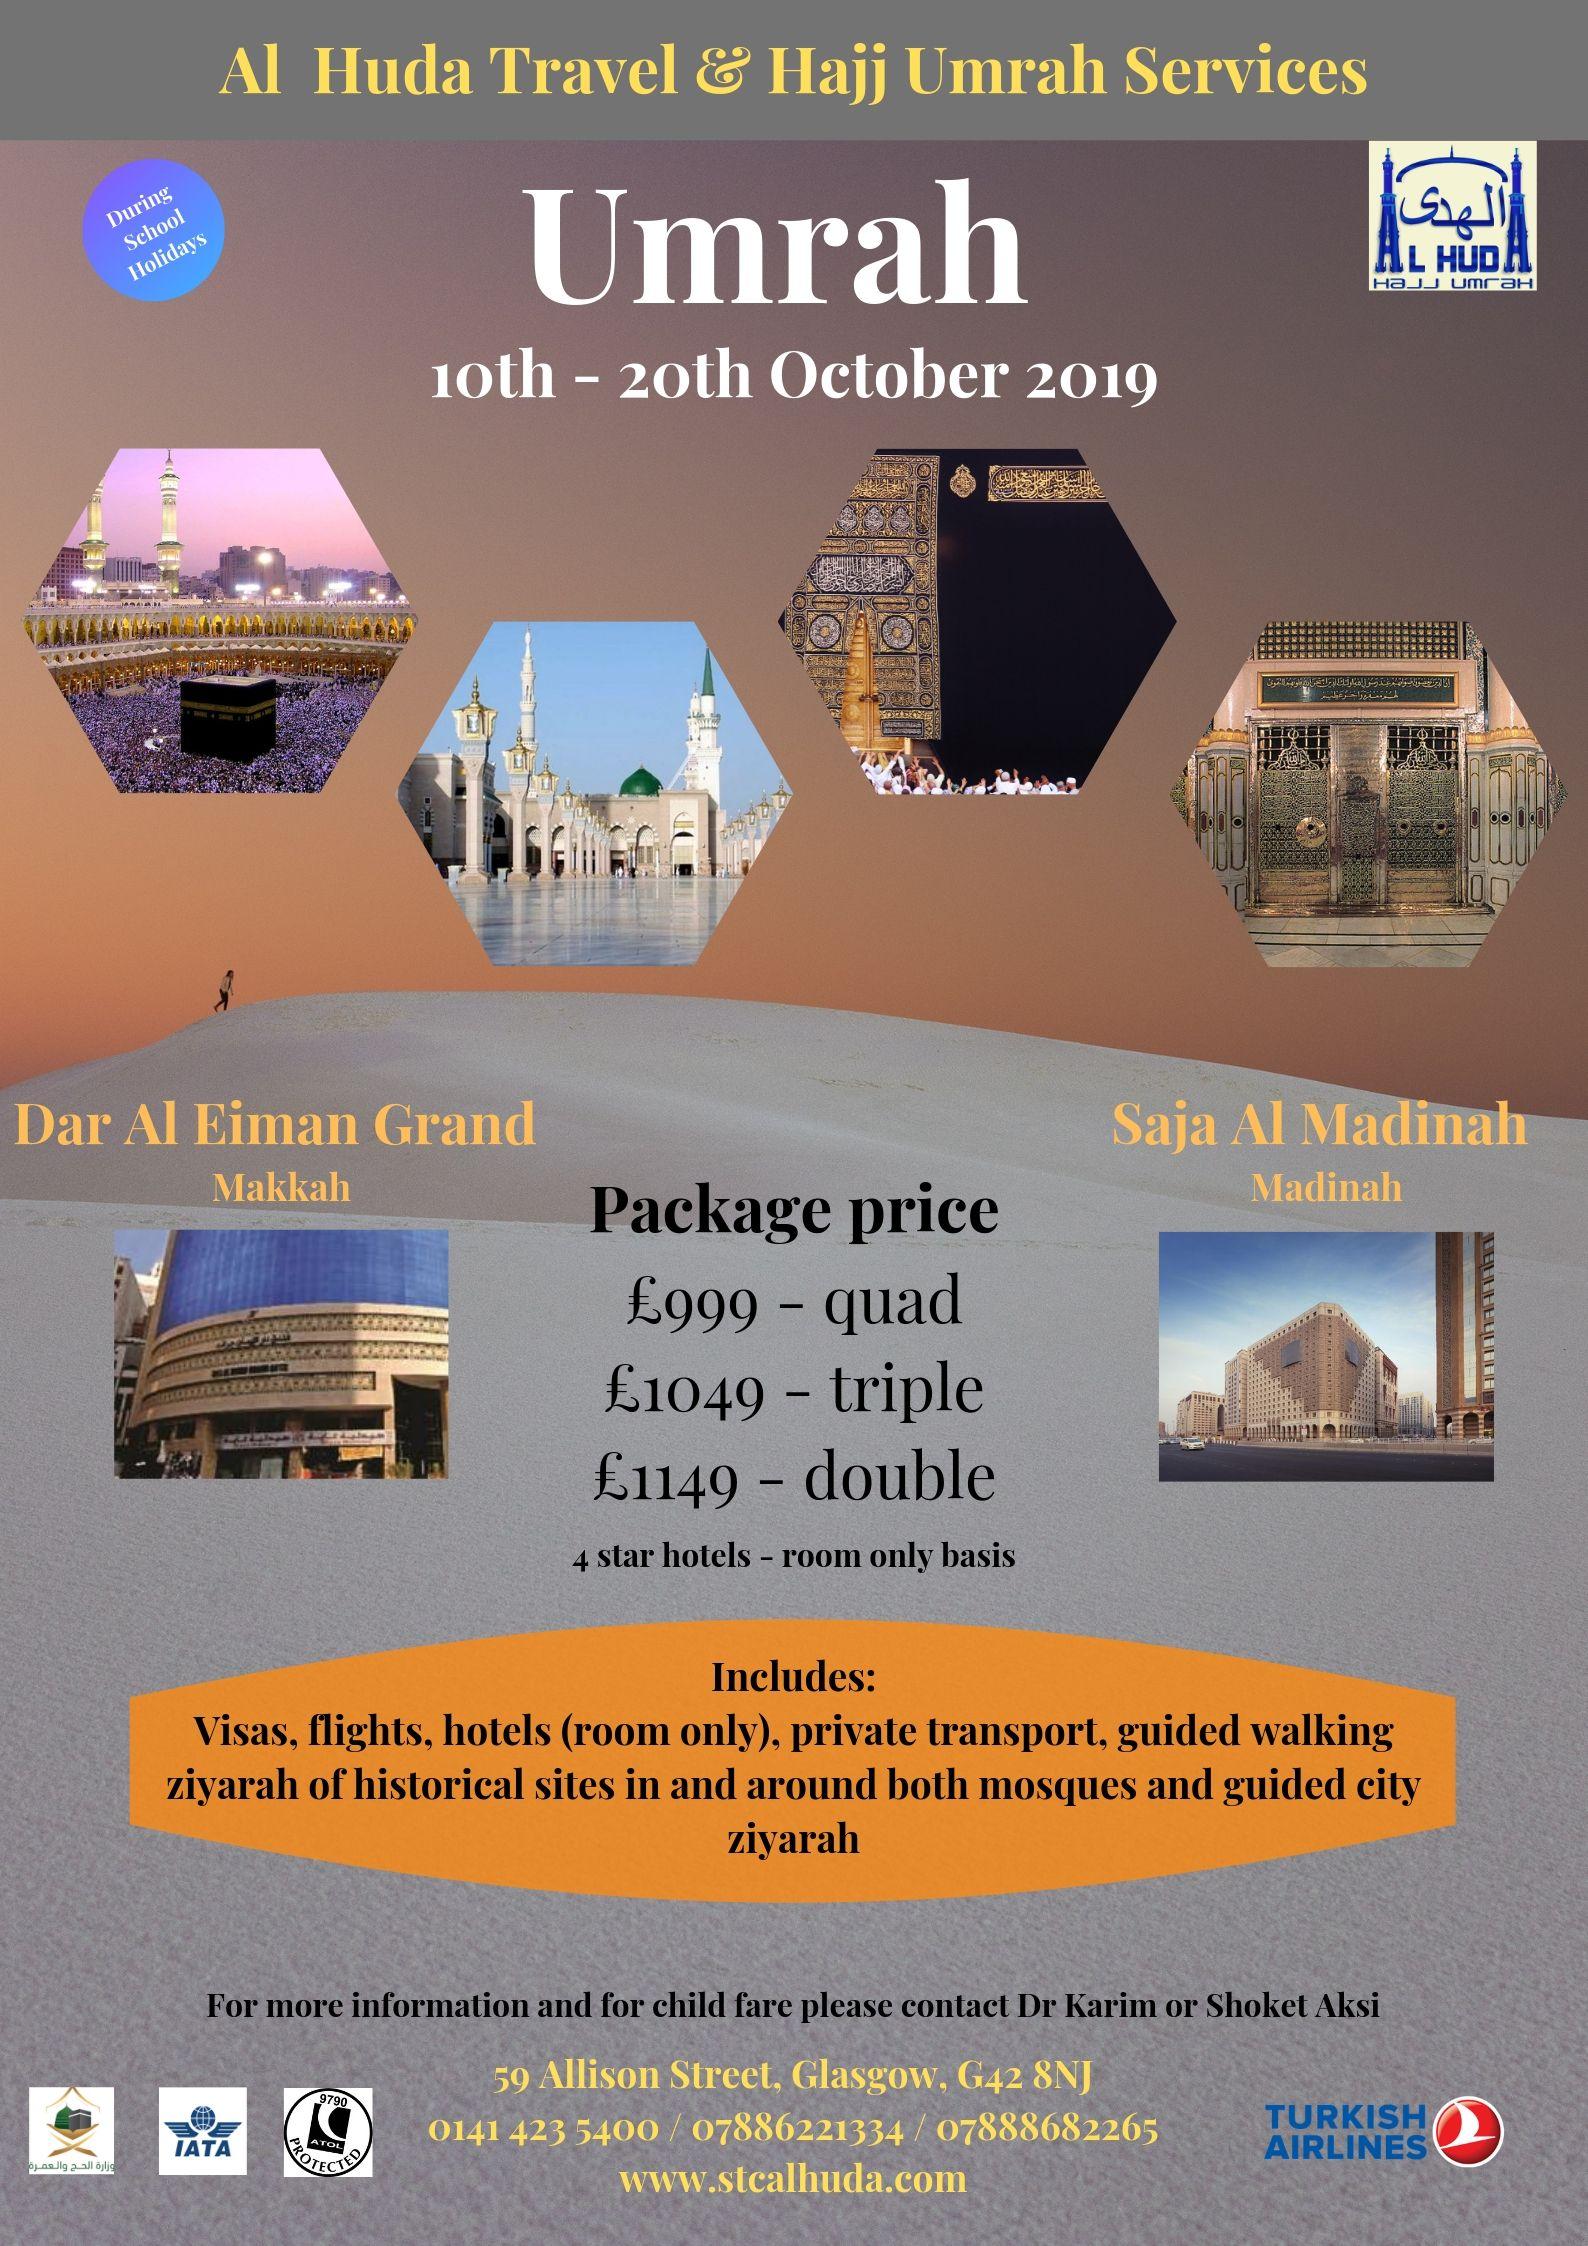 Al Huda Travel Services and Hajj / Umarah | Just another